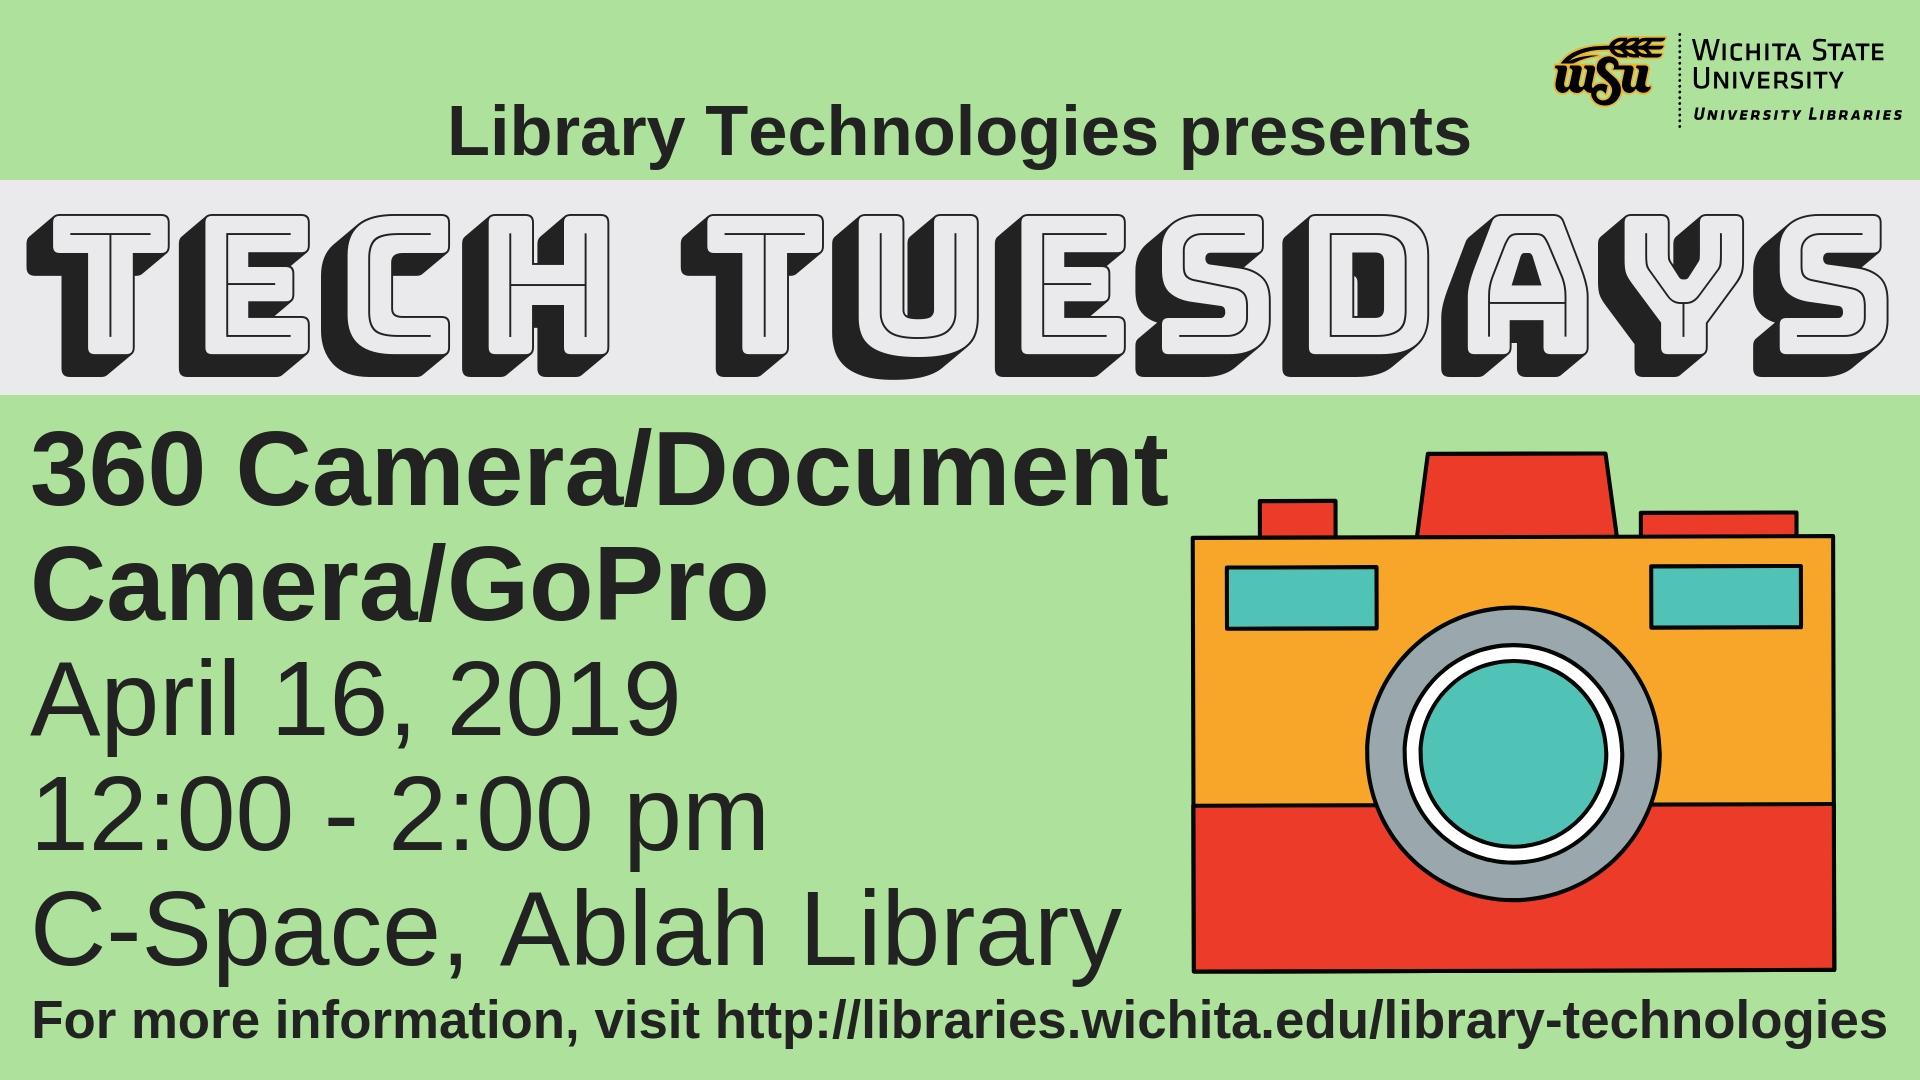 Tech Tuesdays: 360 Camera/Document Camera/GoPro Hero 4